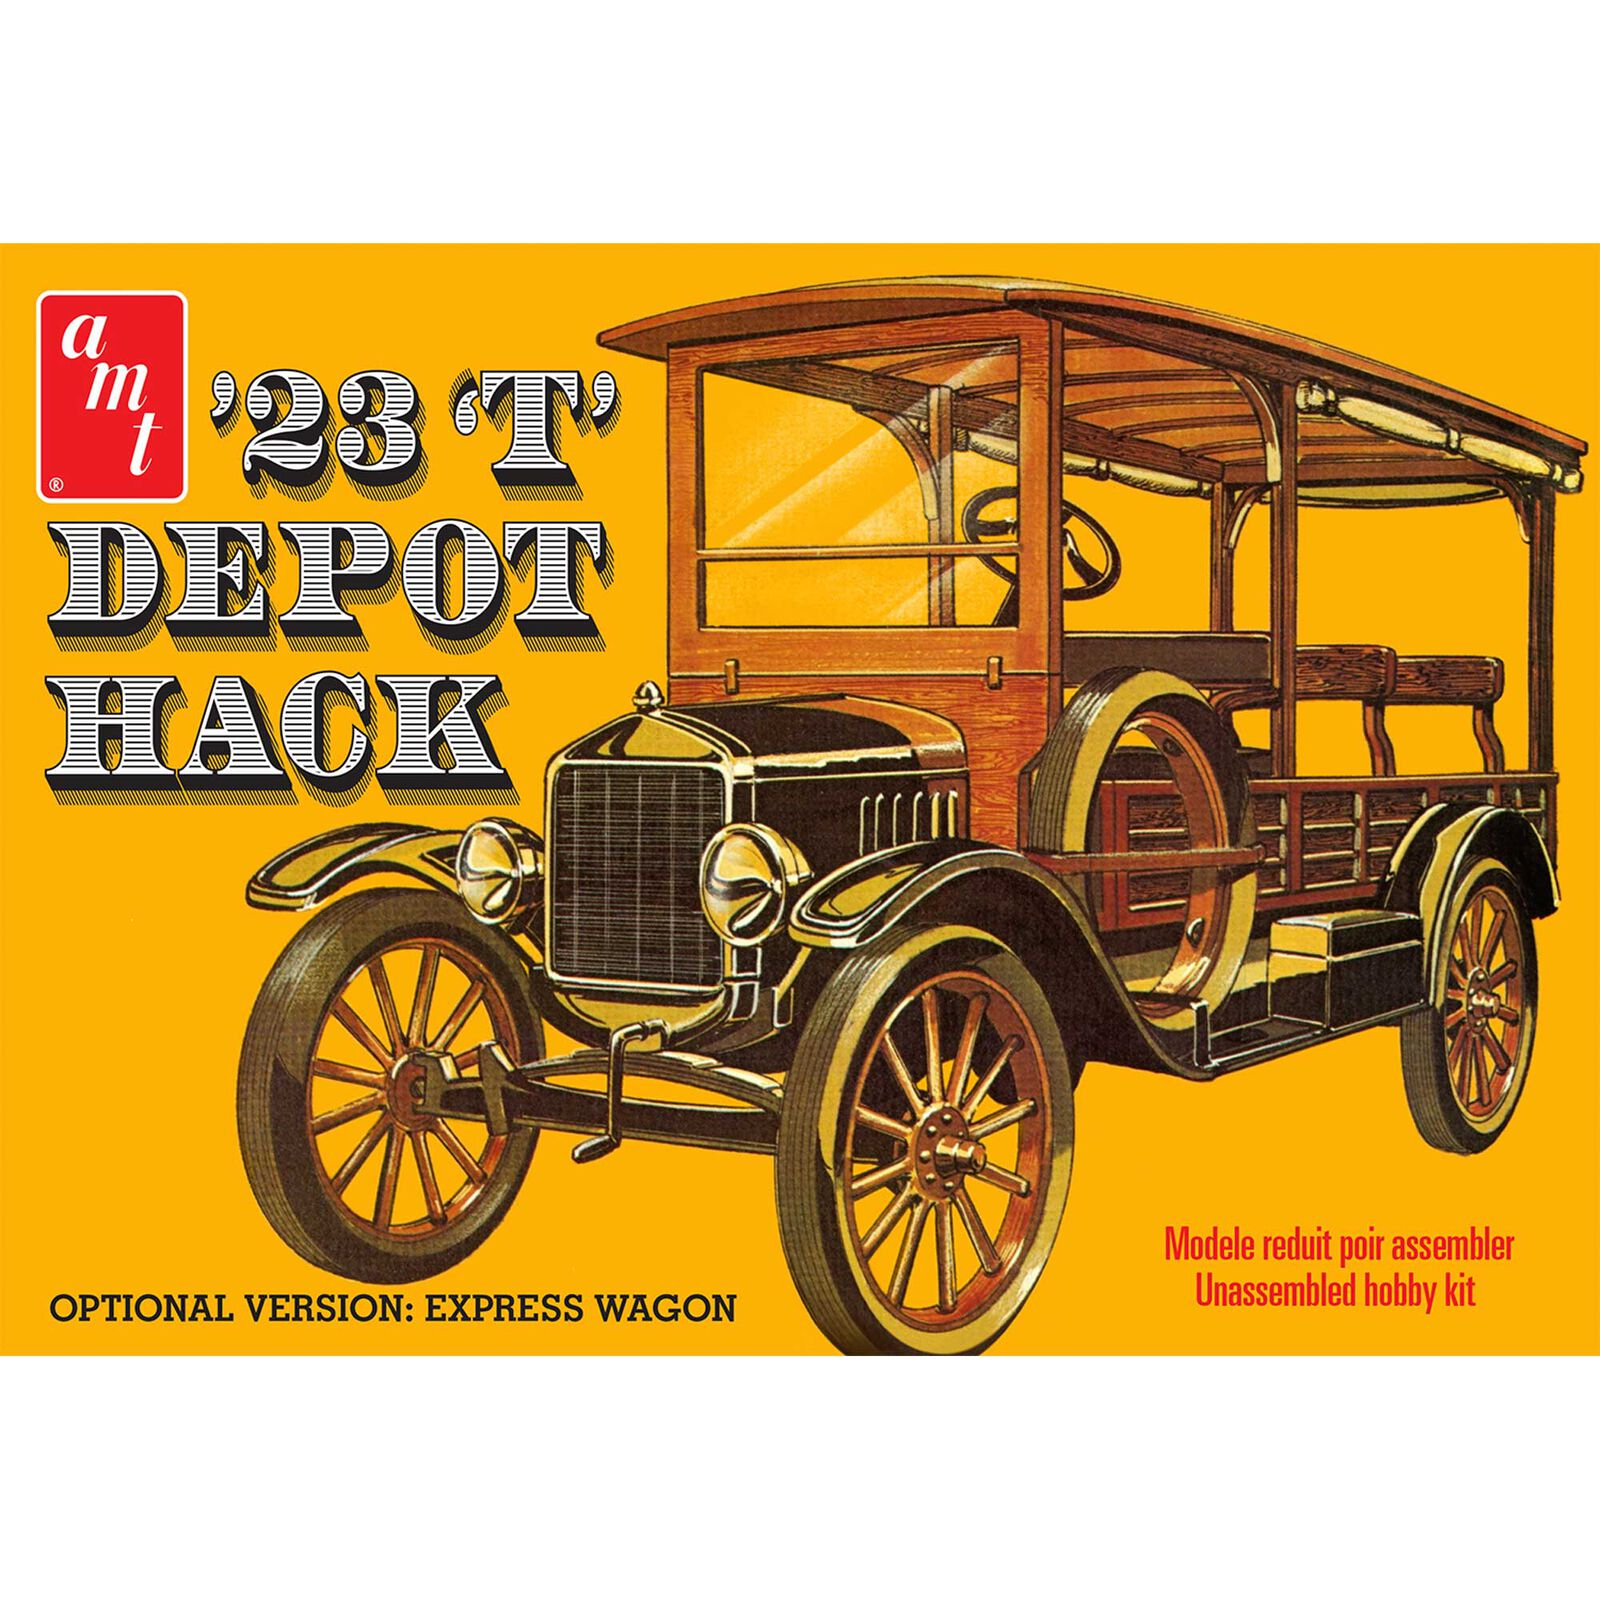 1923 Ford T Depot Hack